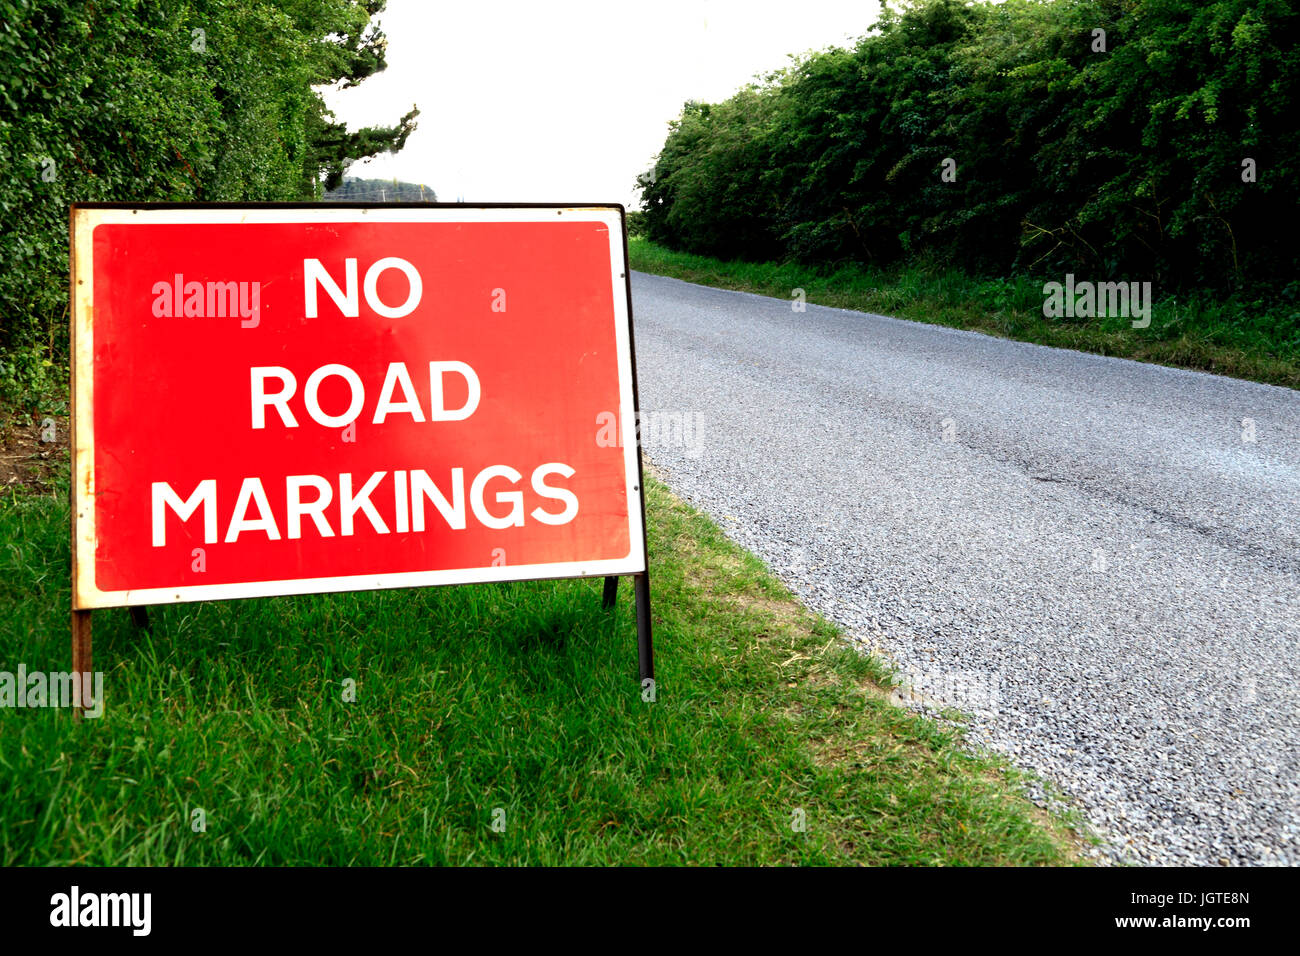 No Road Markings, sign, new road surface, English traffic warning signs, England, UK - Stock Image